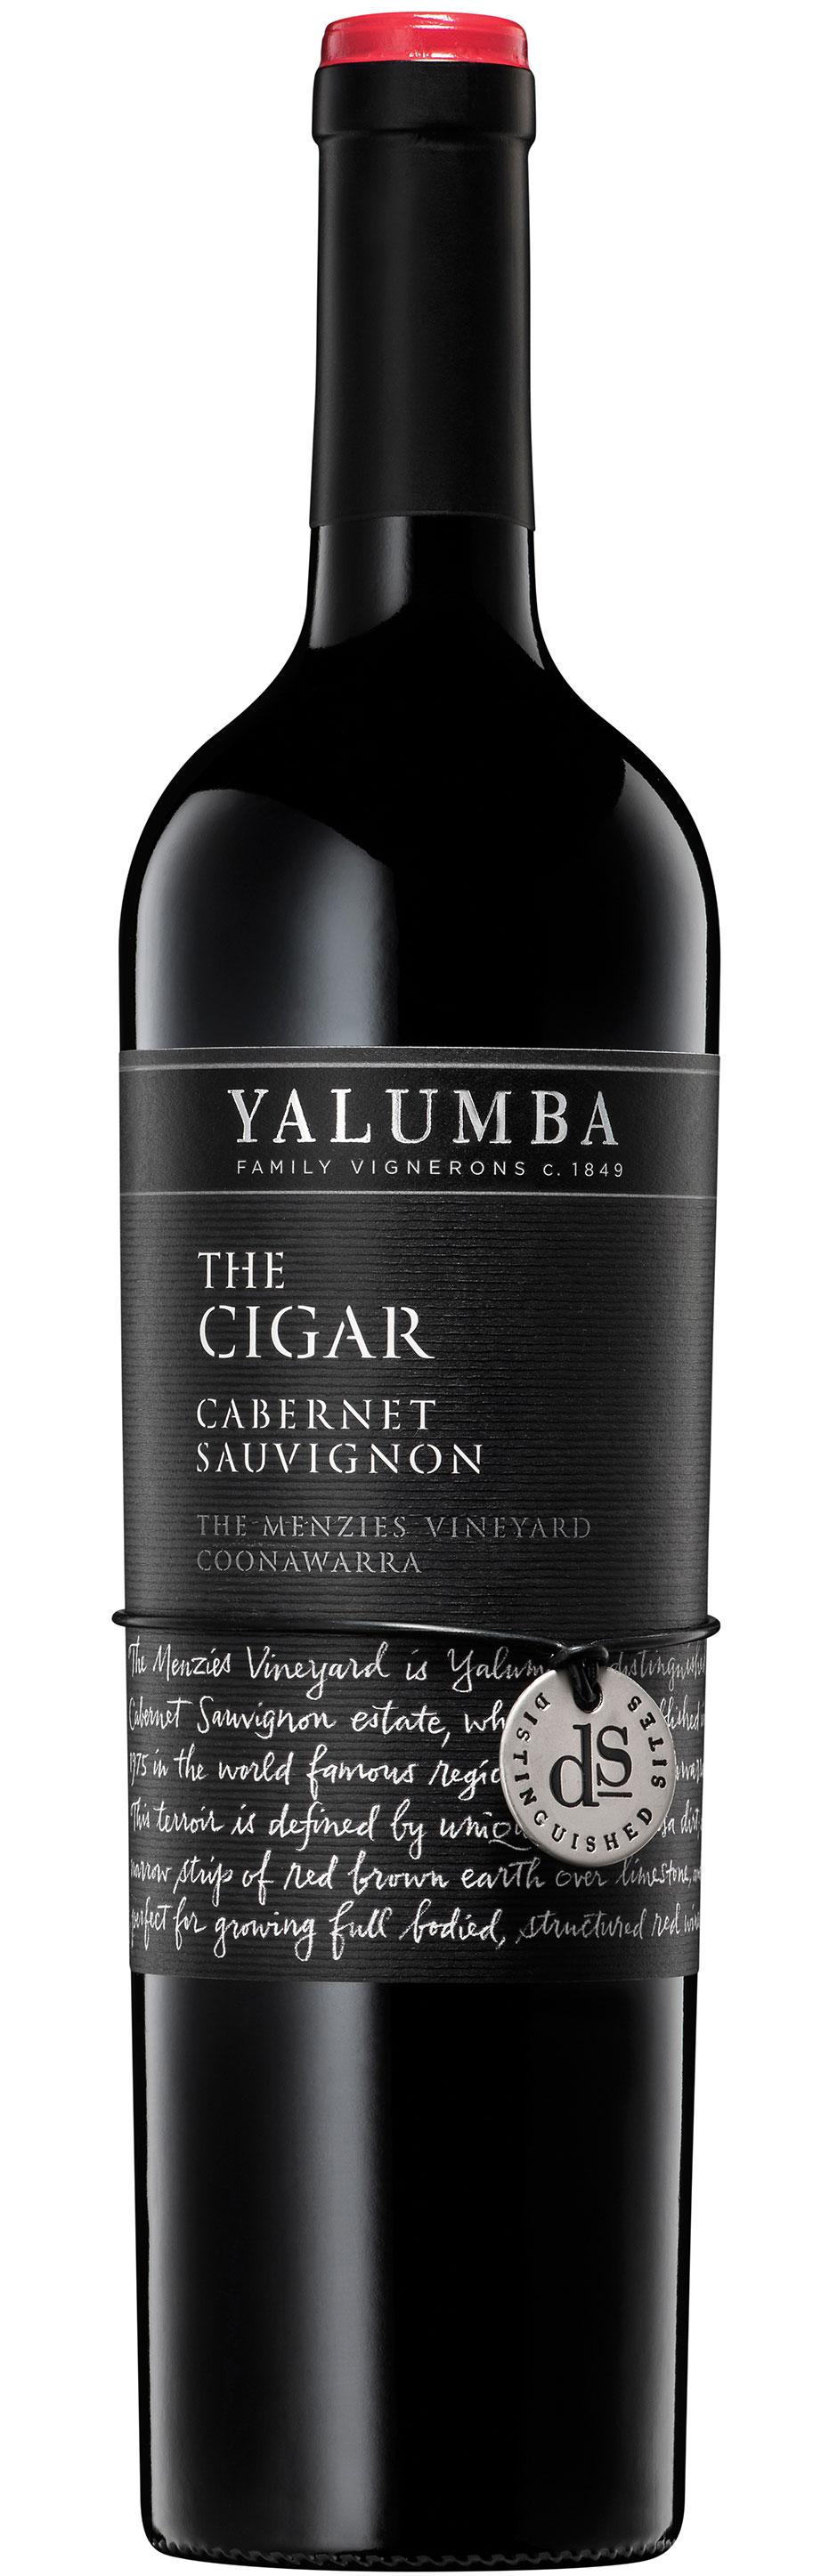 https://vinocorpperu.com/images/vinos/yalumba/the_cigar_cabernet_sauvginon_2016.jpg